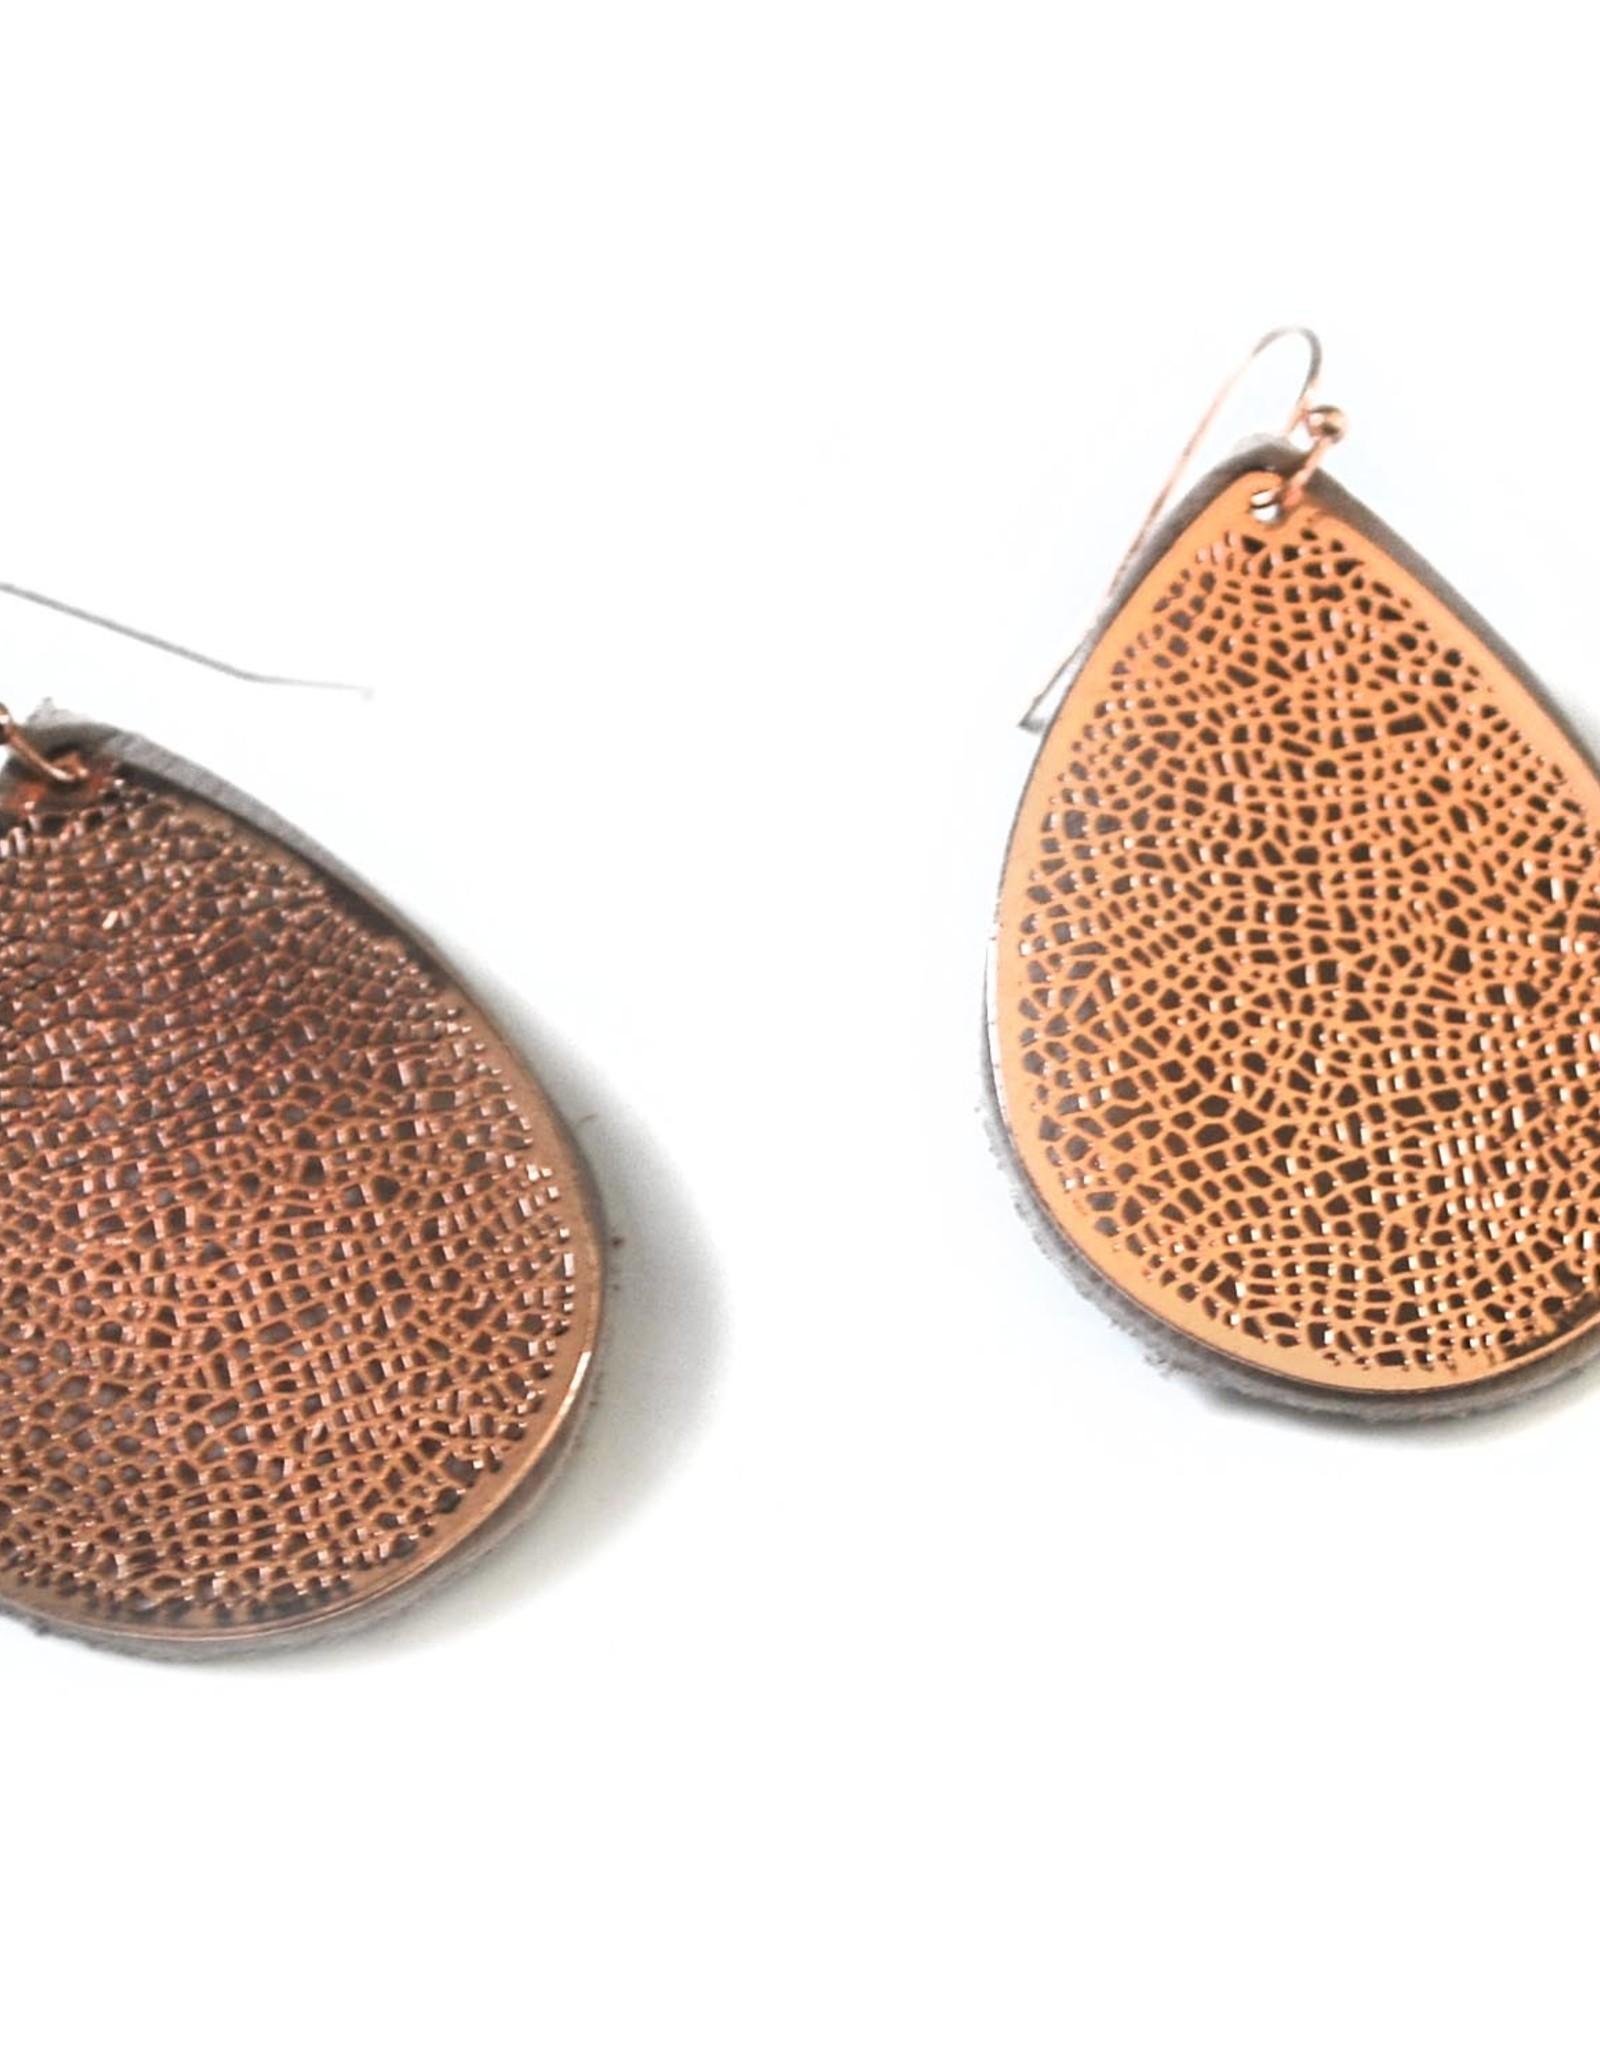 Leather teardrop earrings, Eva Airam Studio